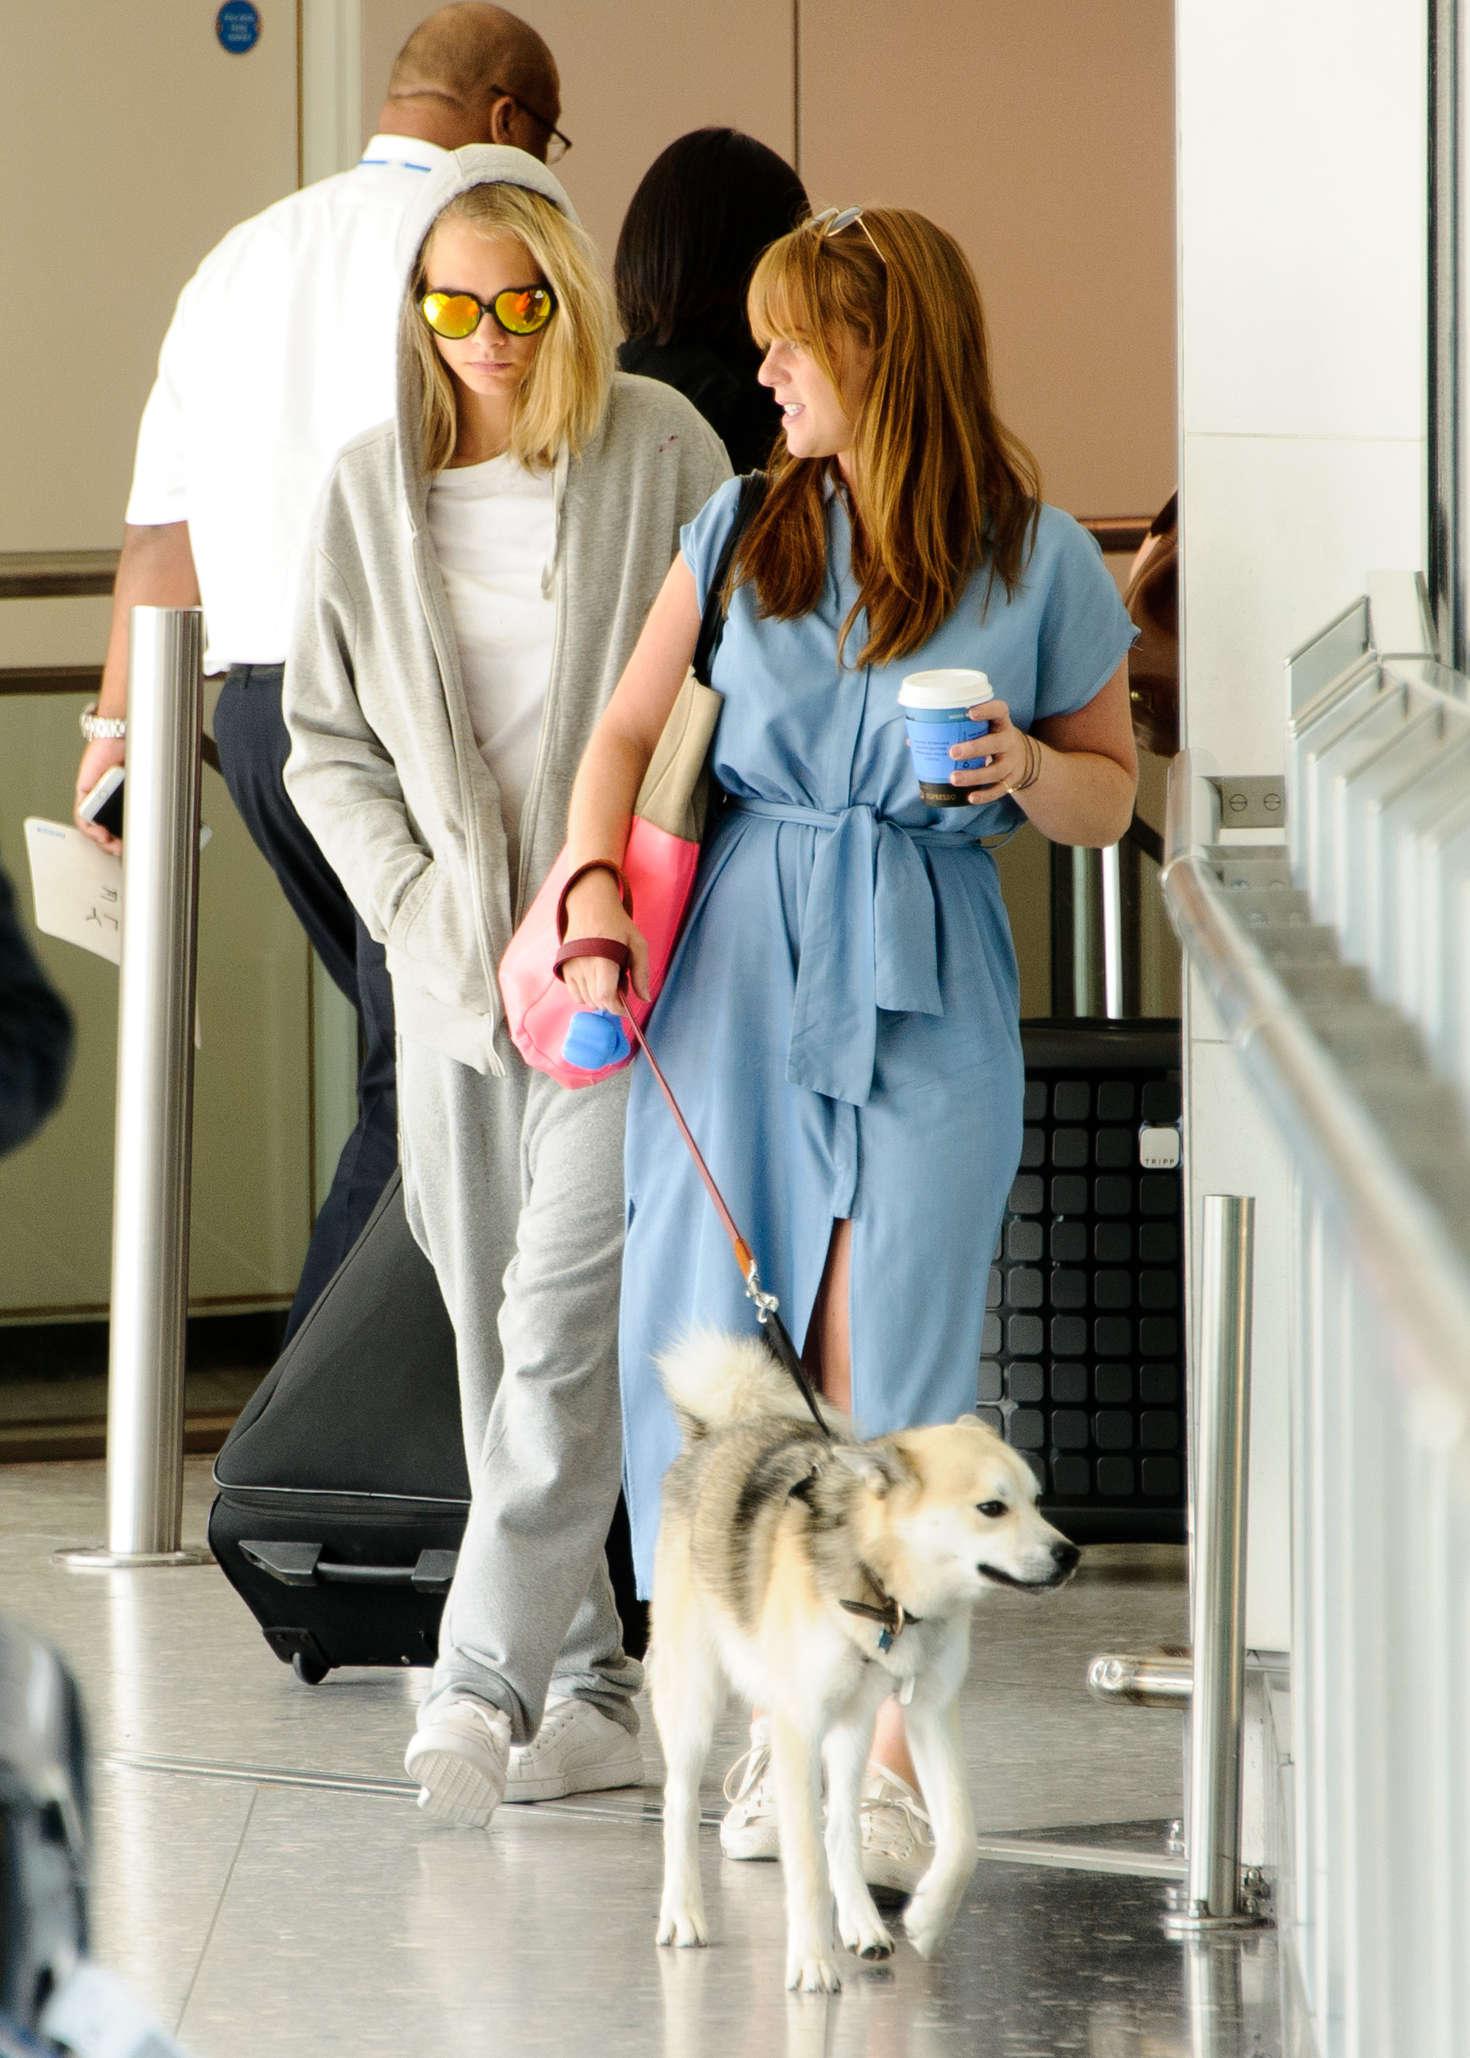 Cara Delevingne 2016 : Cara and Poppy Delevingne Arrive at Heathrow Airport -04